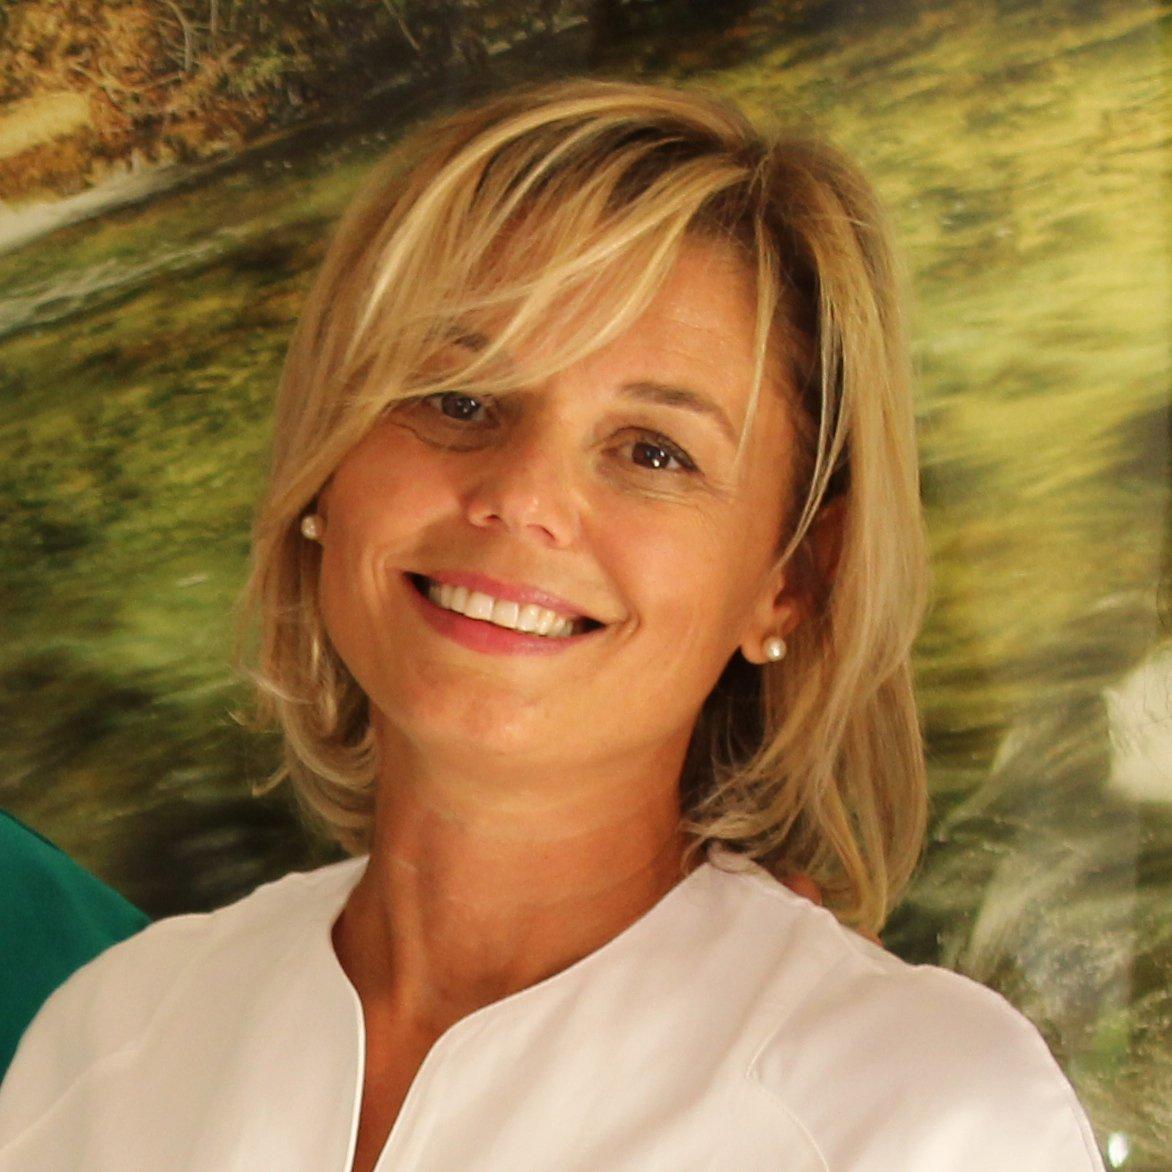 LAURA - Dott.ssa Laura Martinozzi